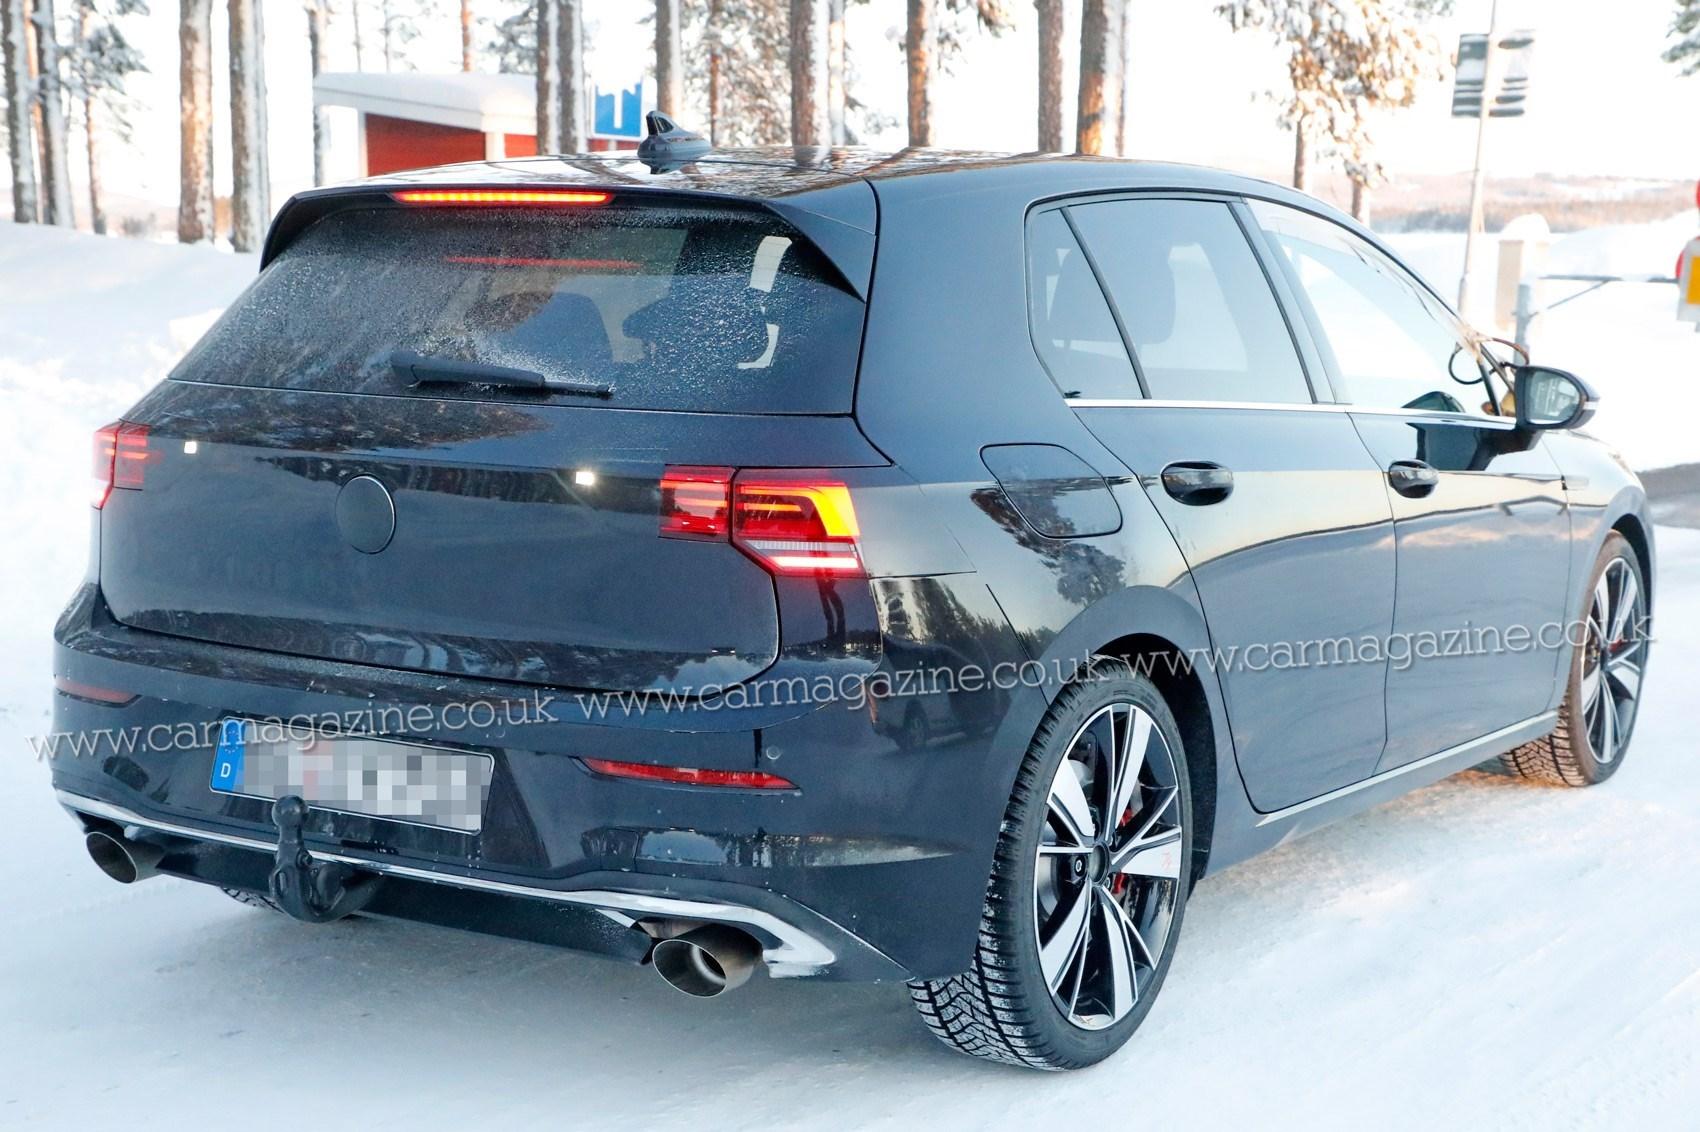 New Vw Golf Gti Performance Polish V8 0 Car Magazine